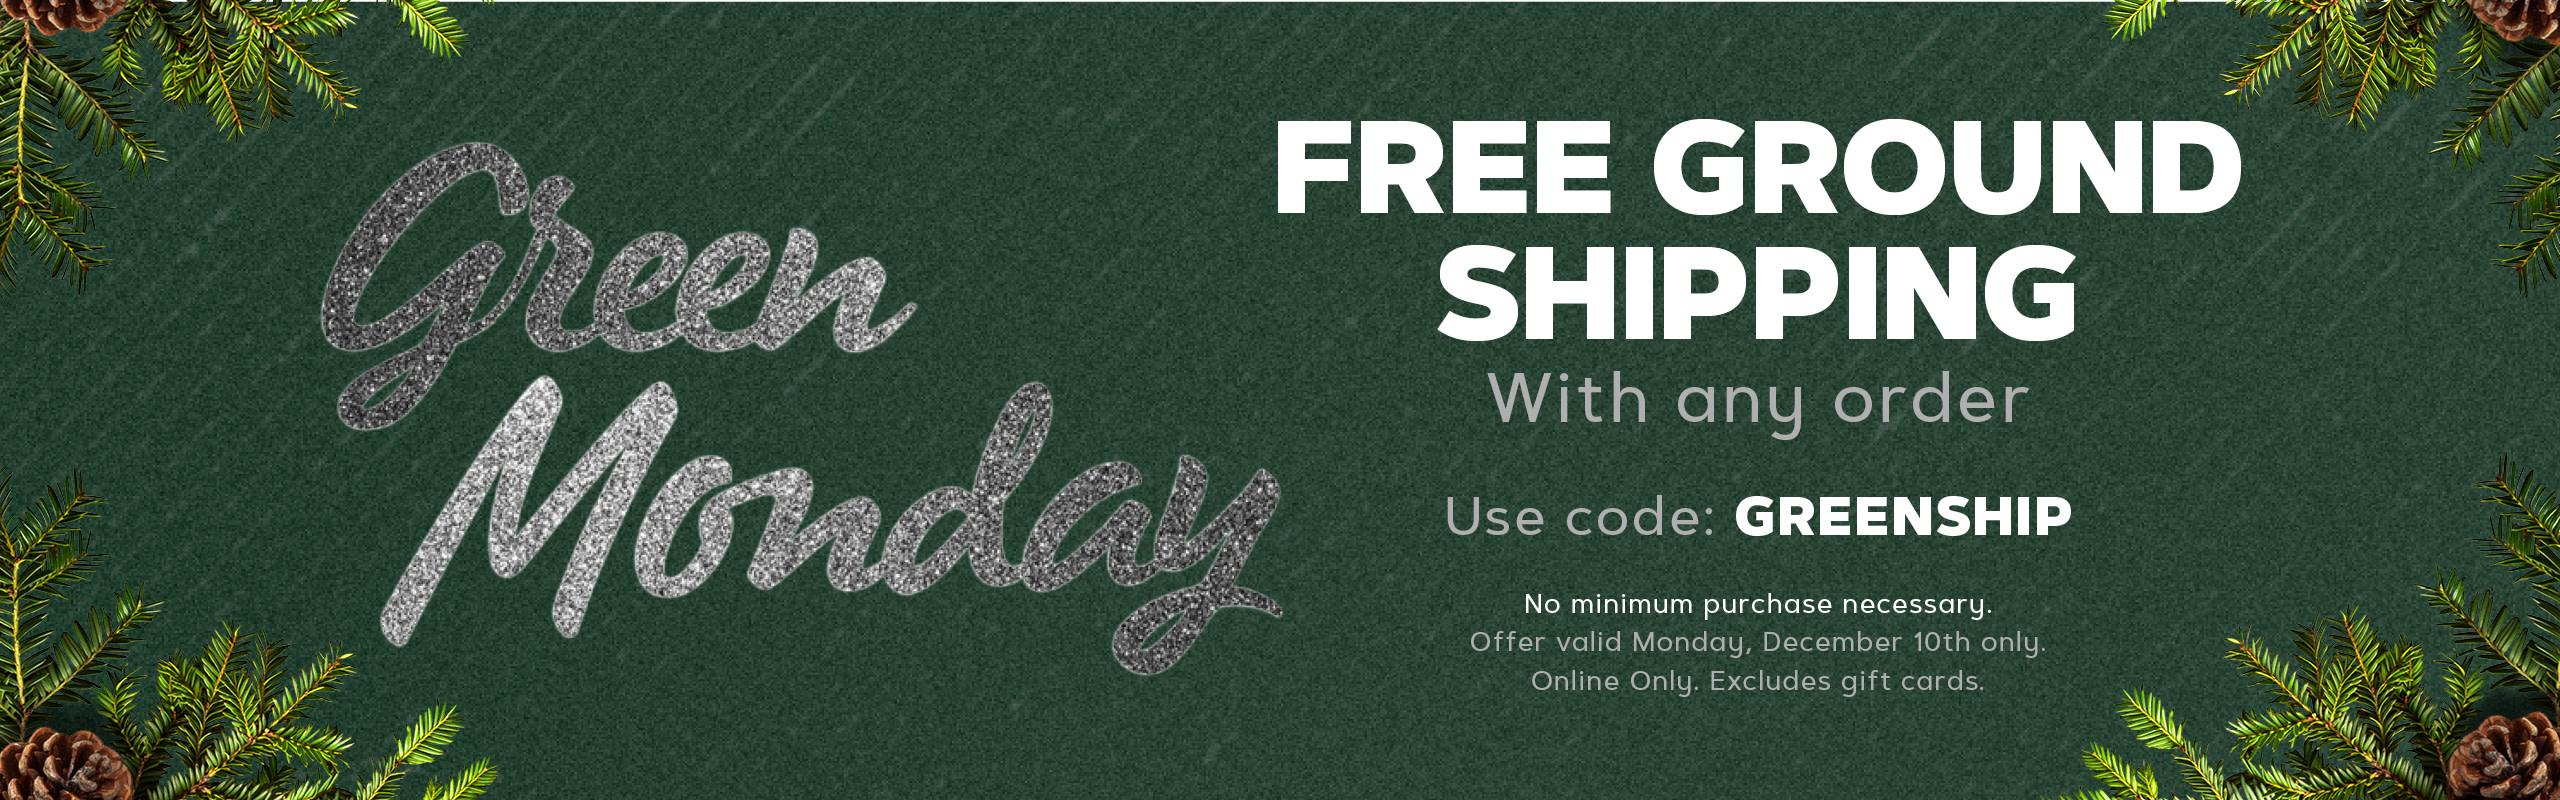 Green Monday sale at Raider Image